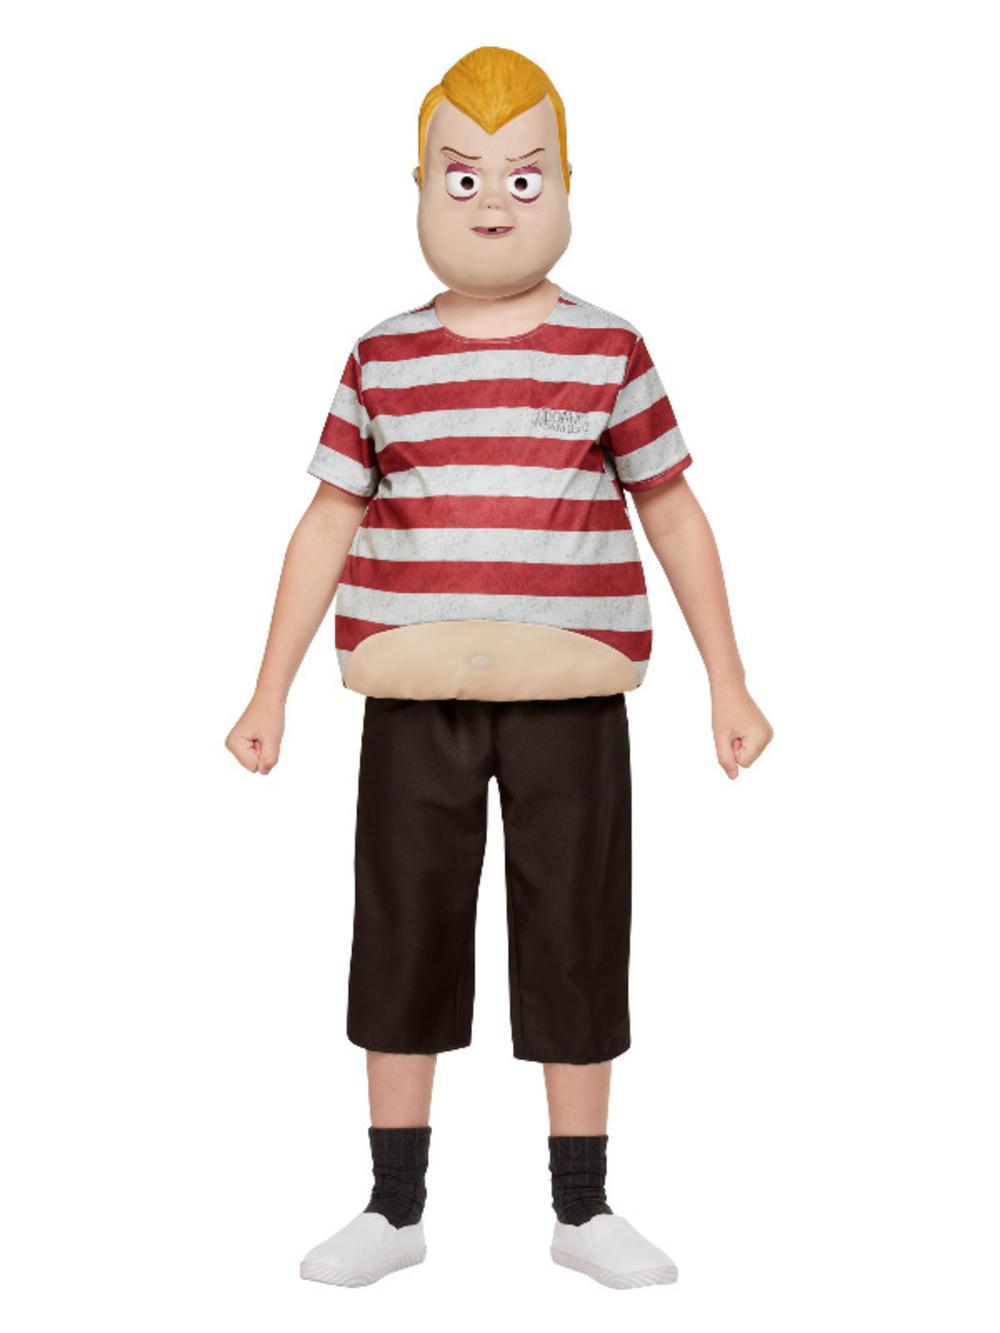 Pugsley Addams Family Boys Costume